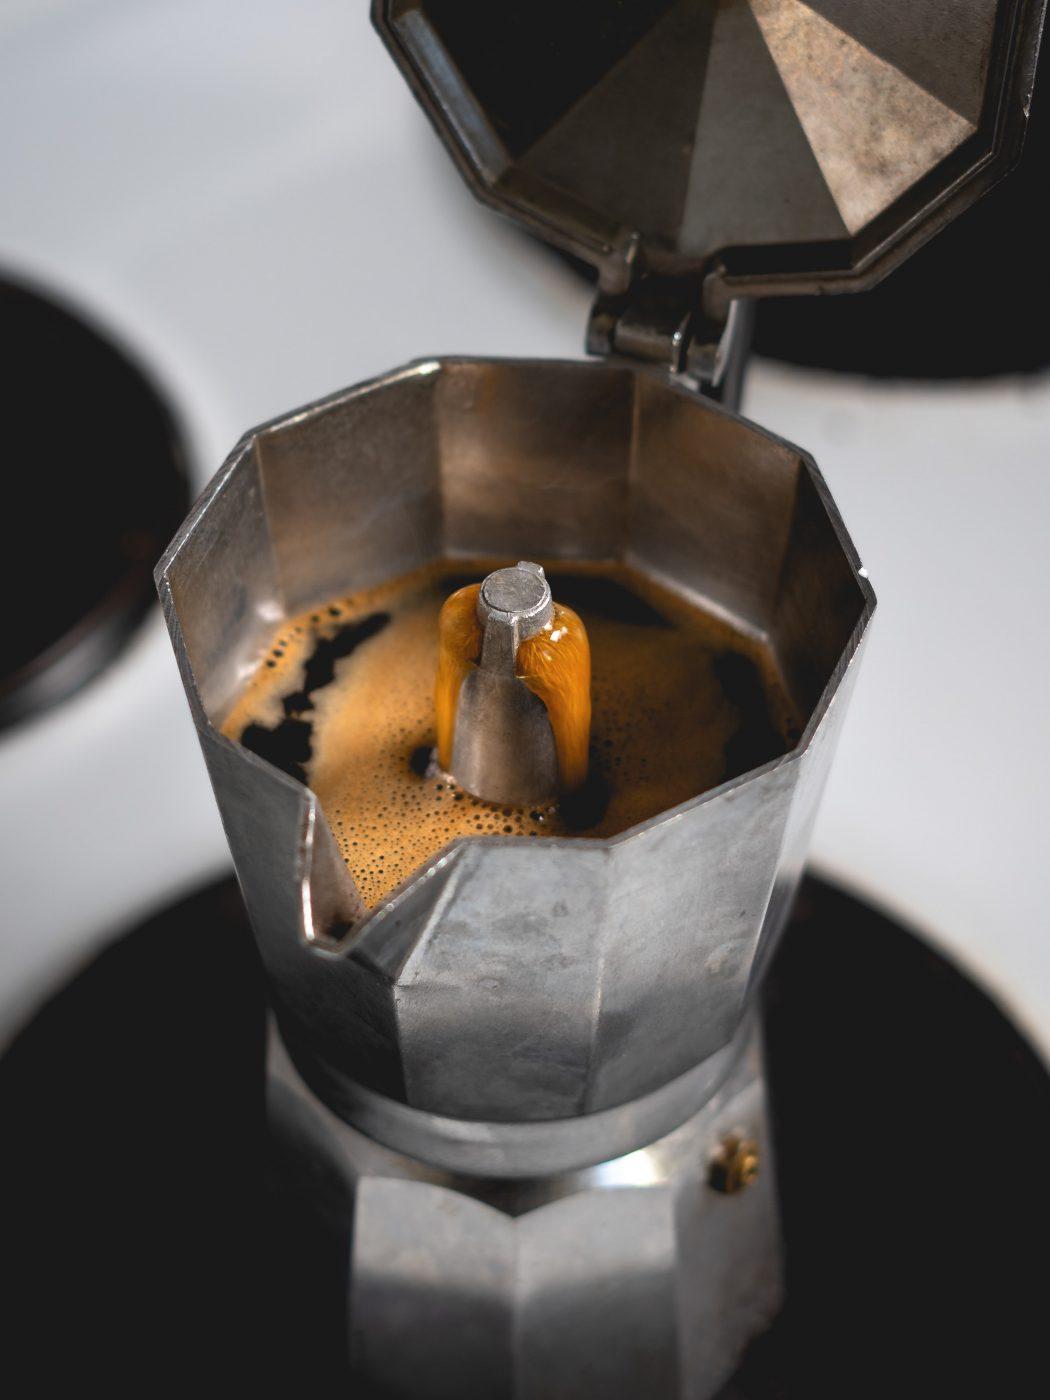 Italian coffee with moka